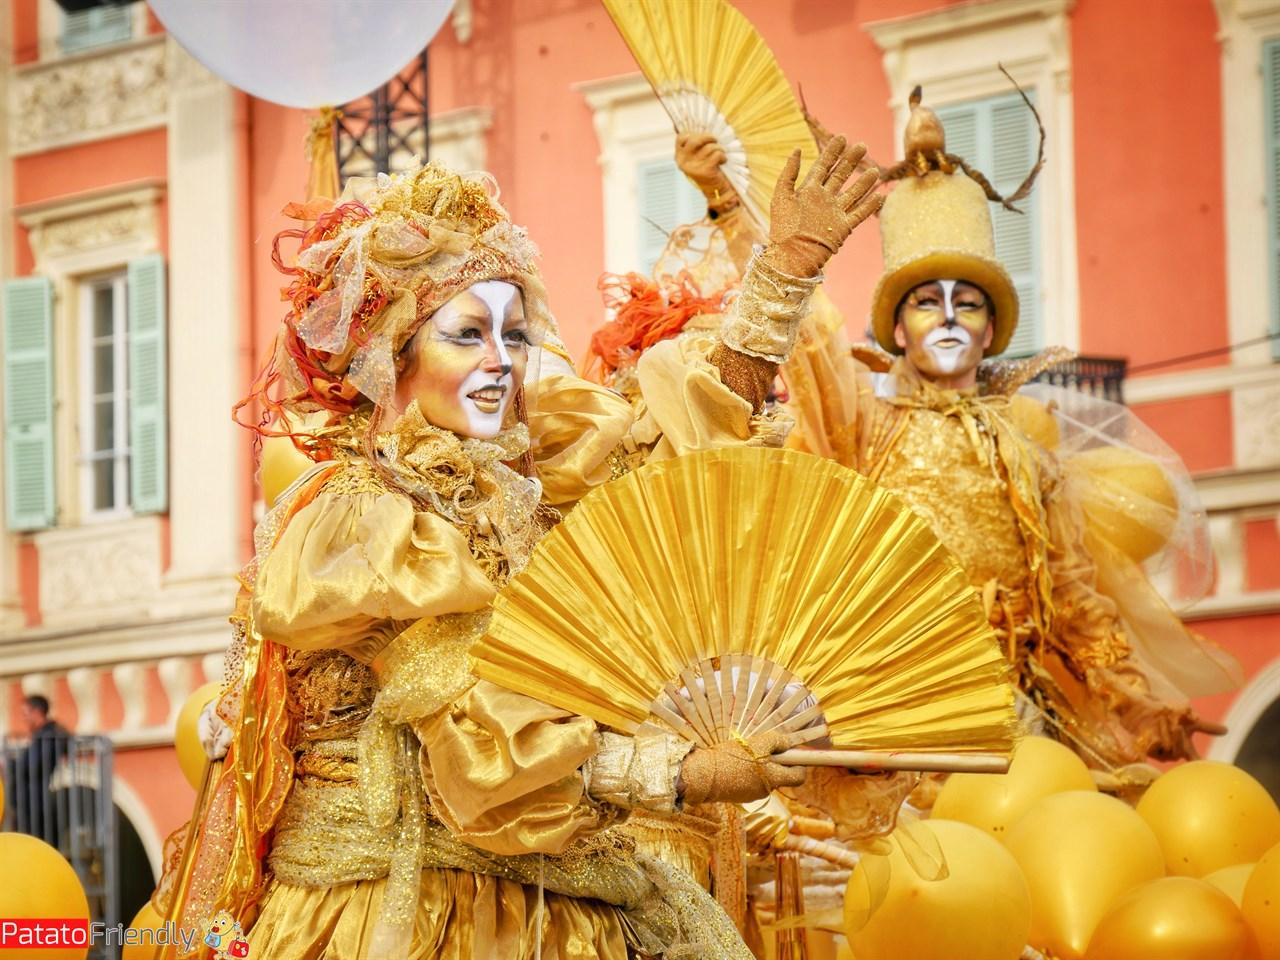 [cml_media_alt id='13585']Carnevale di Nizza per bambini - le maschere[/cml_media_alt]